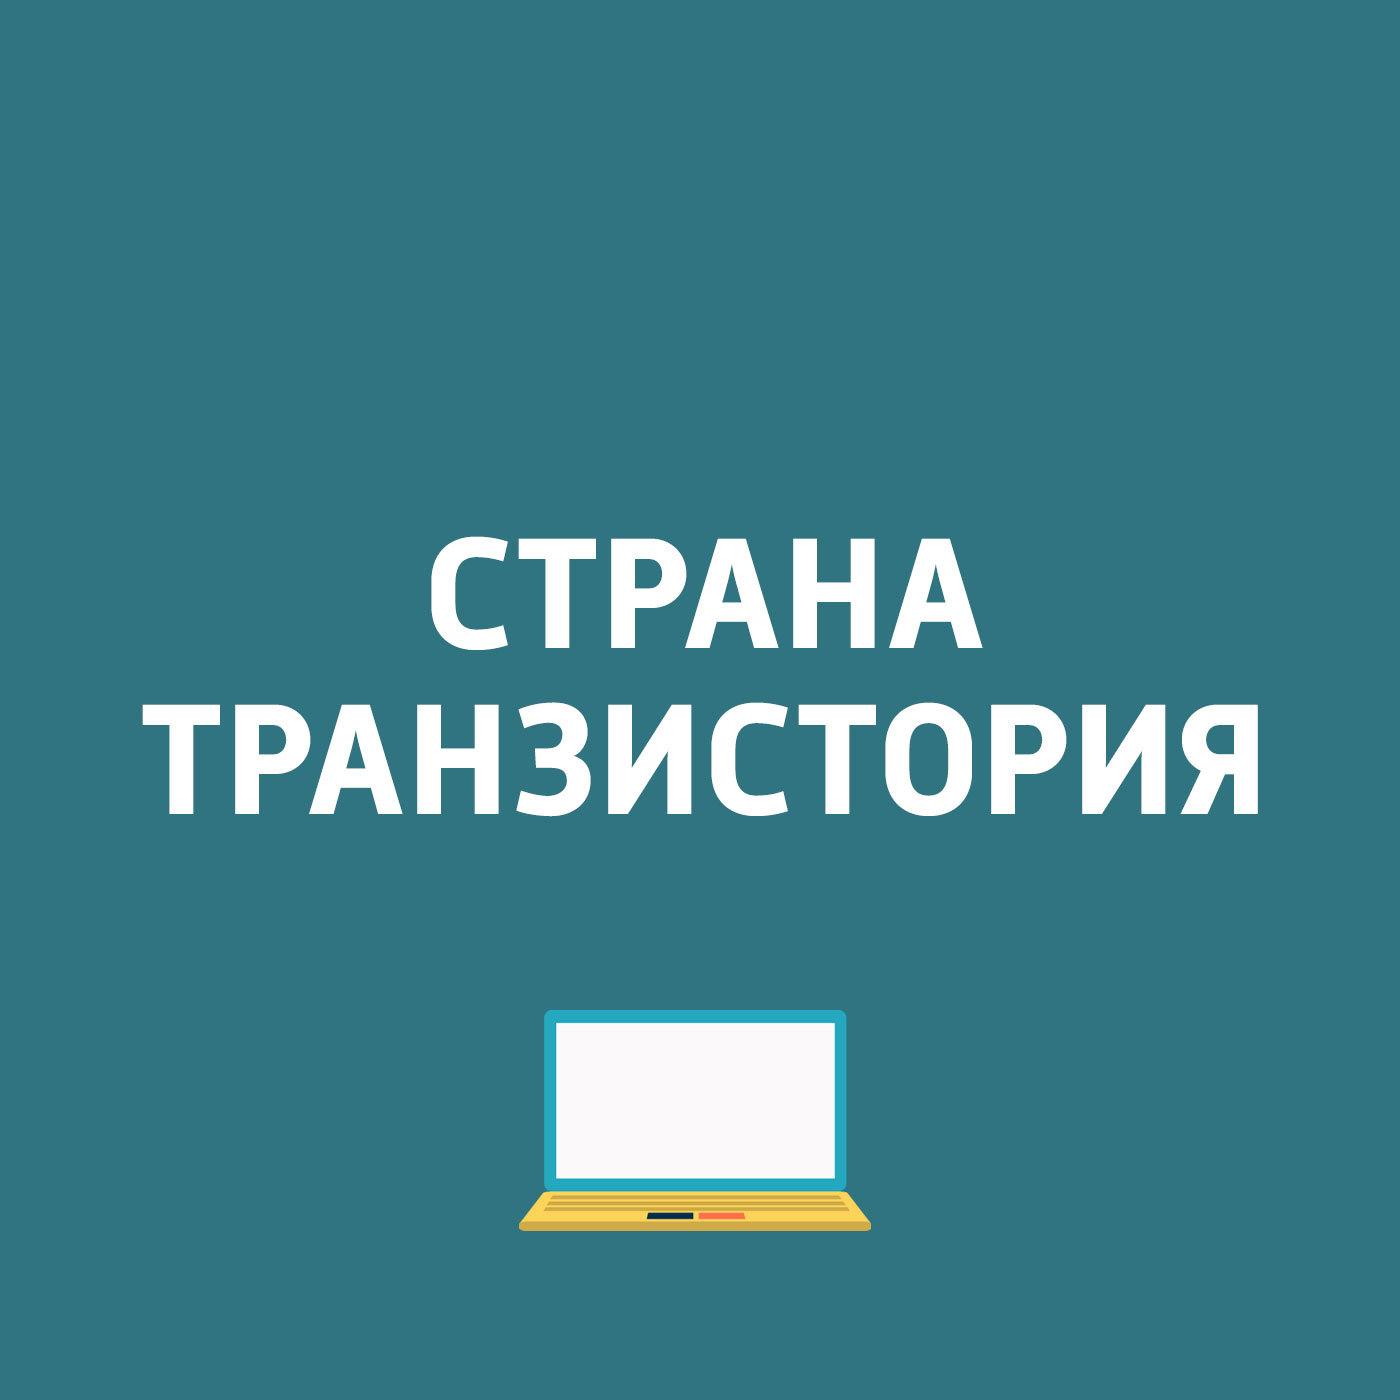 Mail.Ru Groupобъявила о запуске нового мессенджера TamTam